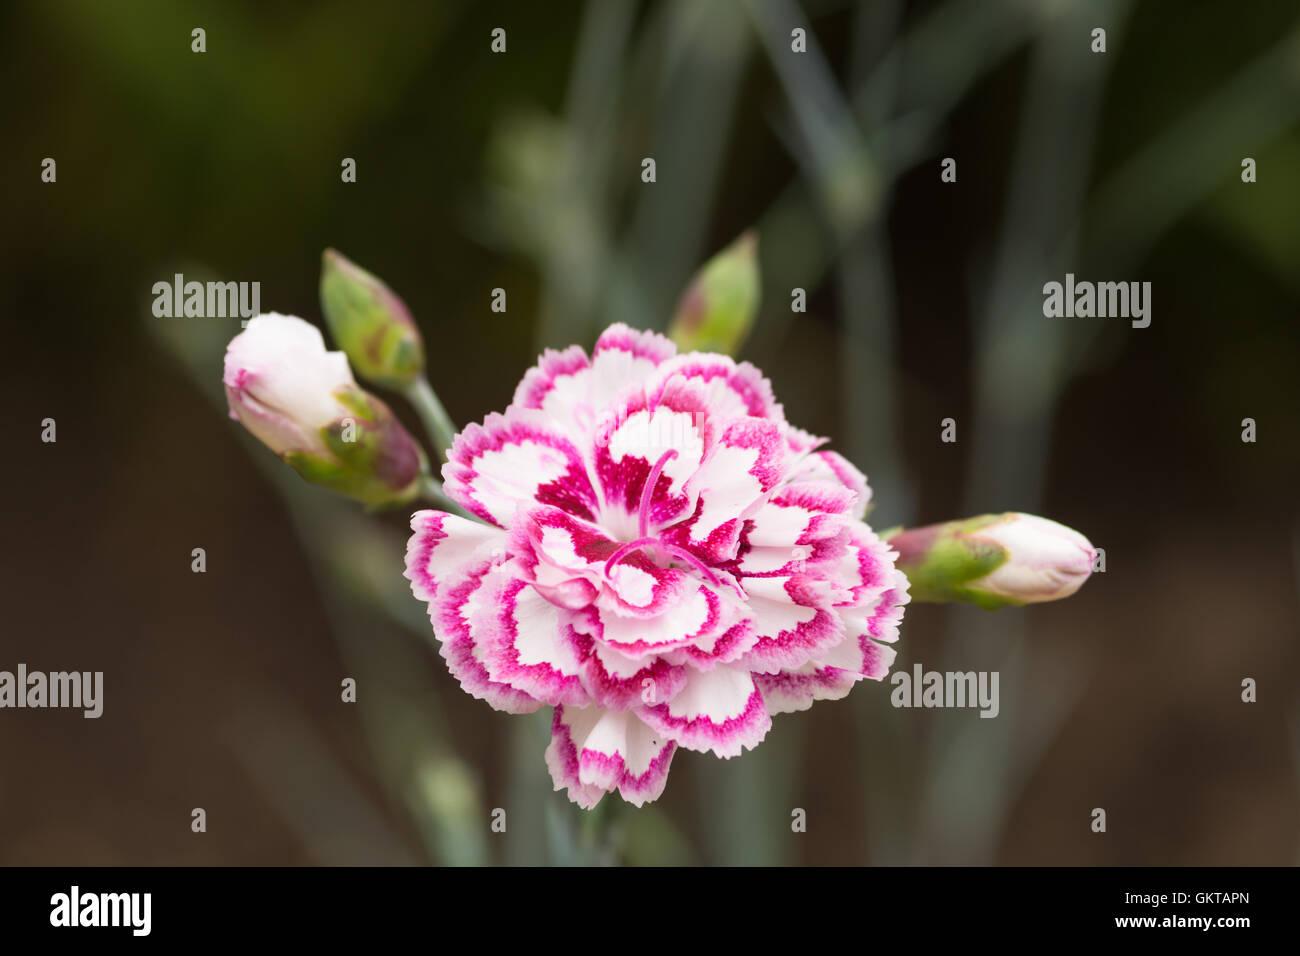 Dianthus 'Grans favourite' - Stock Image